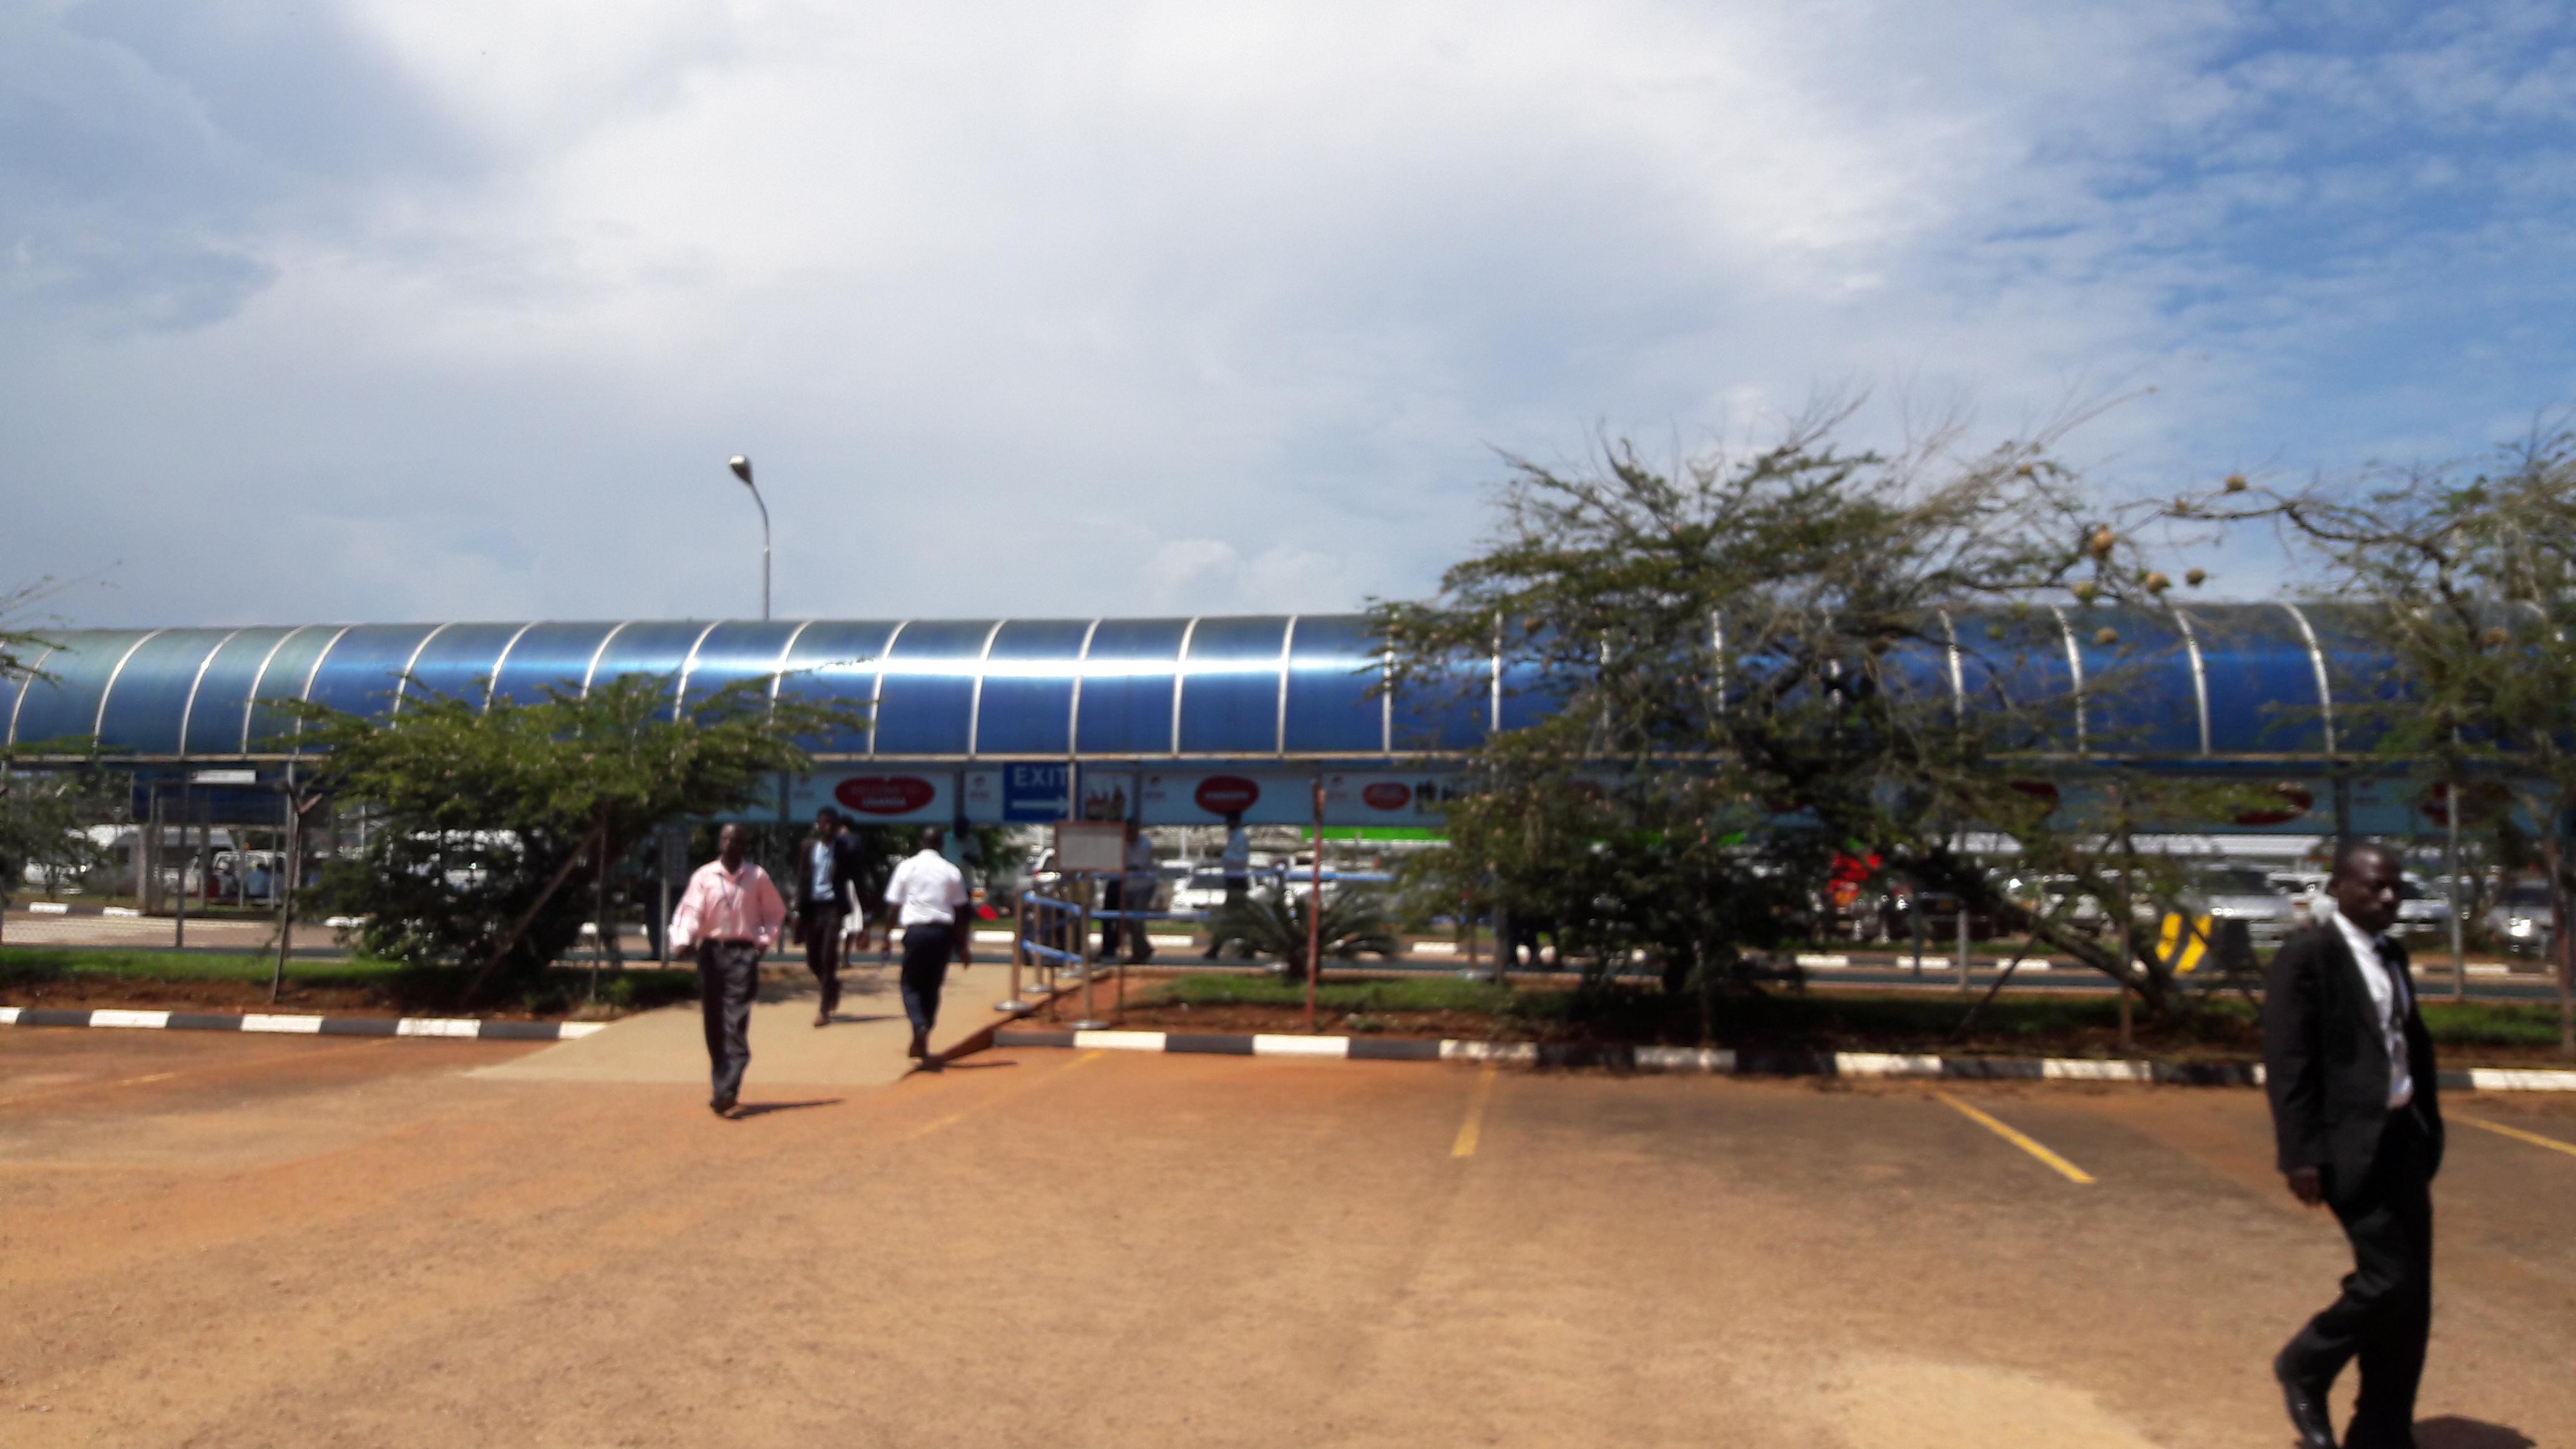 entebbe-airport-arriving-to-parking-apr18